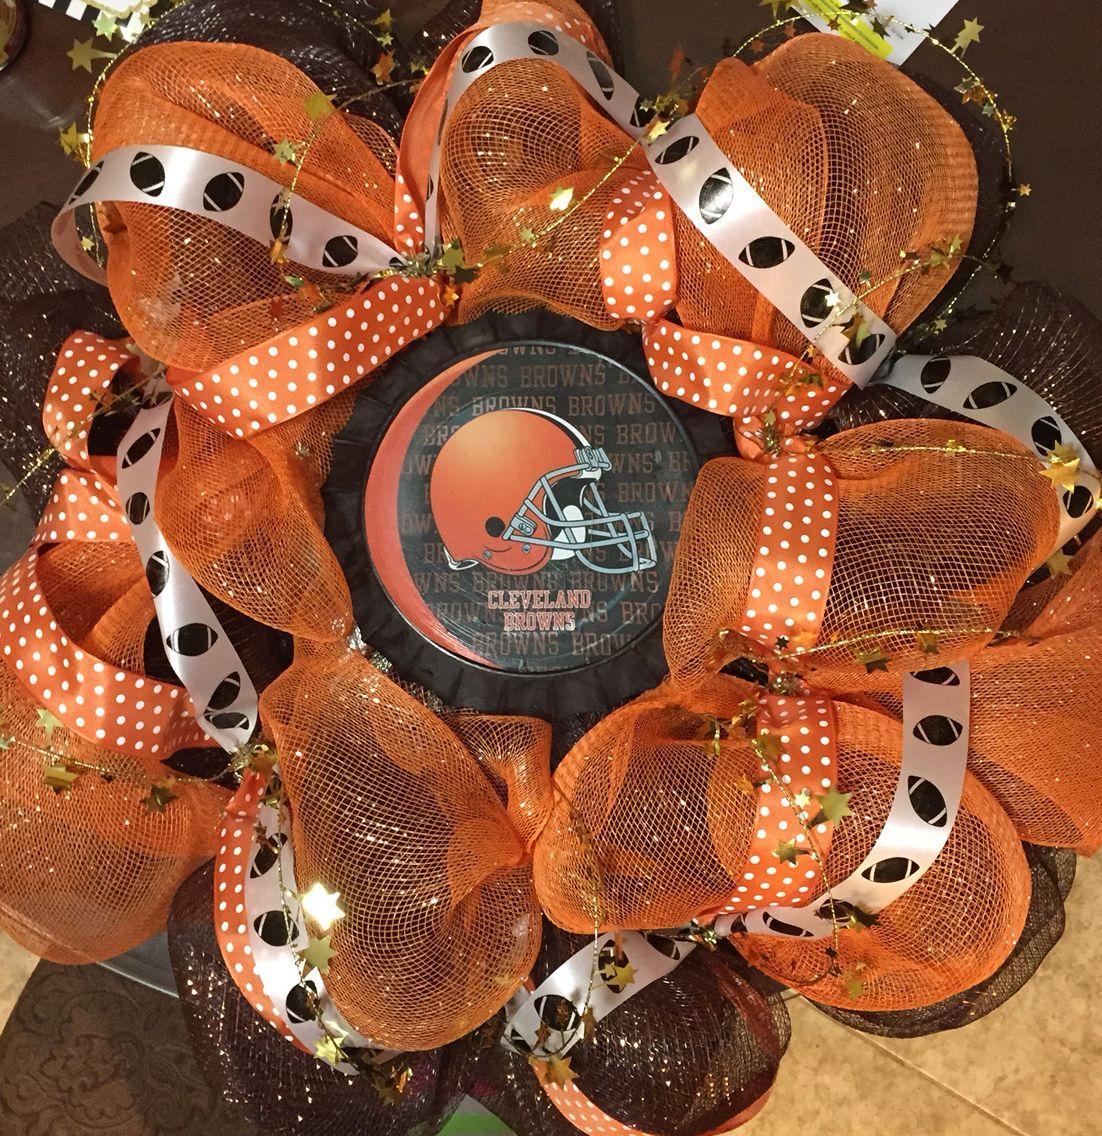 Cleveland Browns Mesh Wreath Mesh wreaths, Wreaths